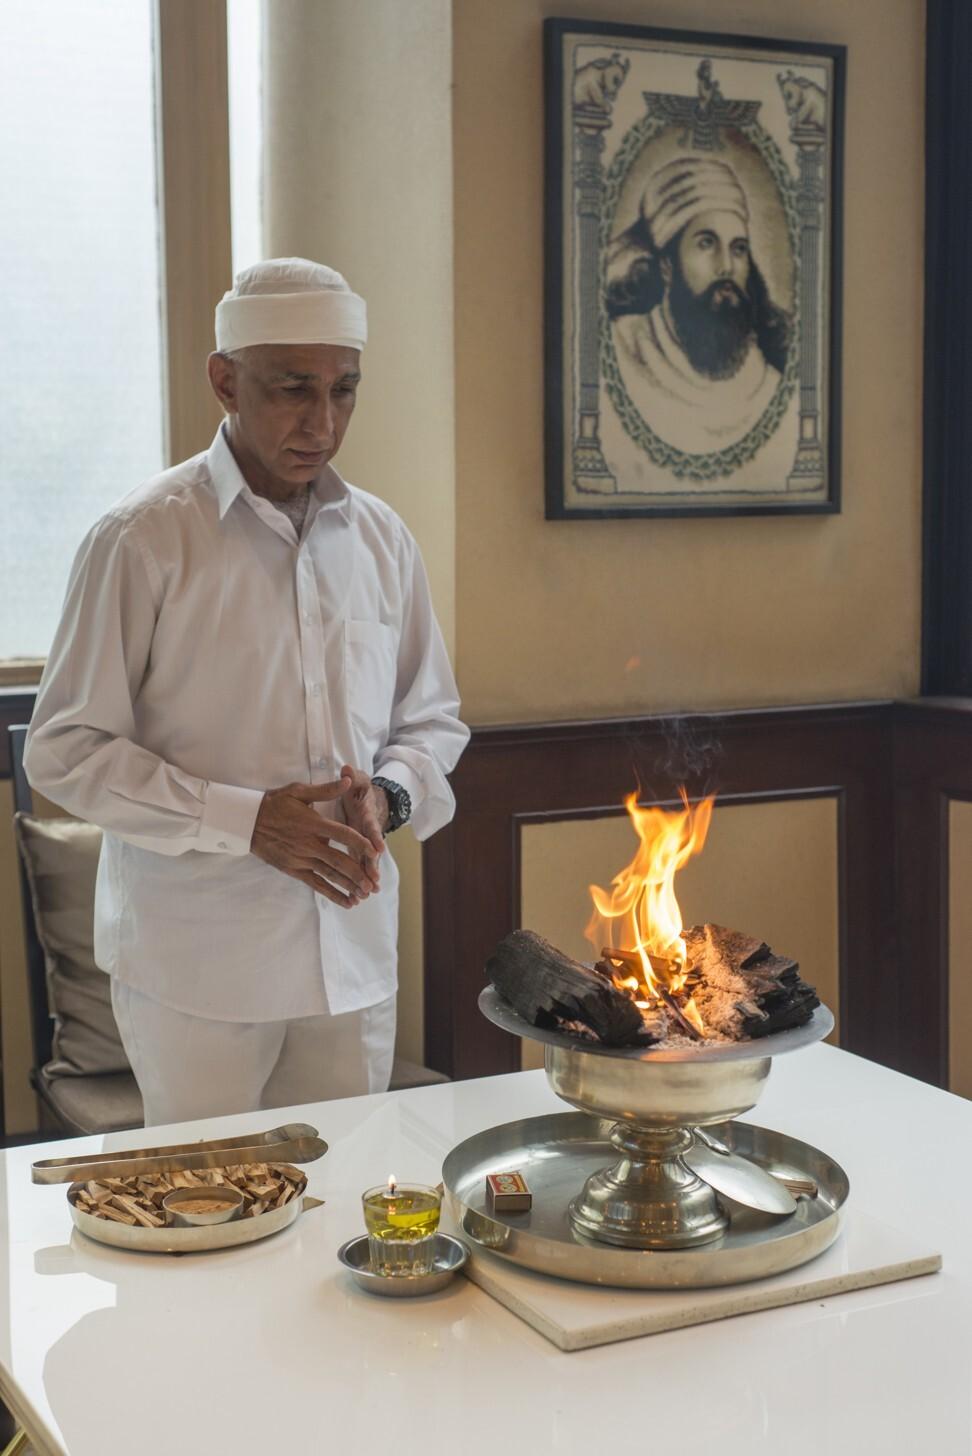 Zoroastrian priest Homyar Nasirabadwala in the Zoroastrian Prayer Hall at the Zoroastrian Building, in Causeway Bay. Photo: Antony Dickson